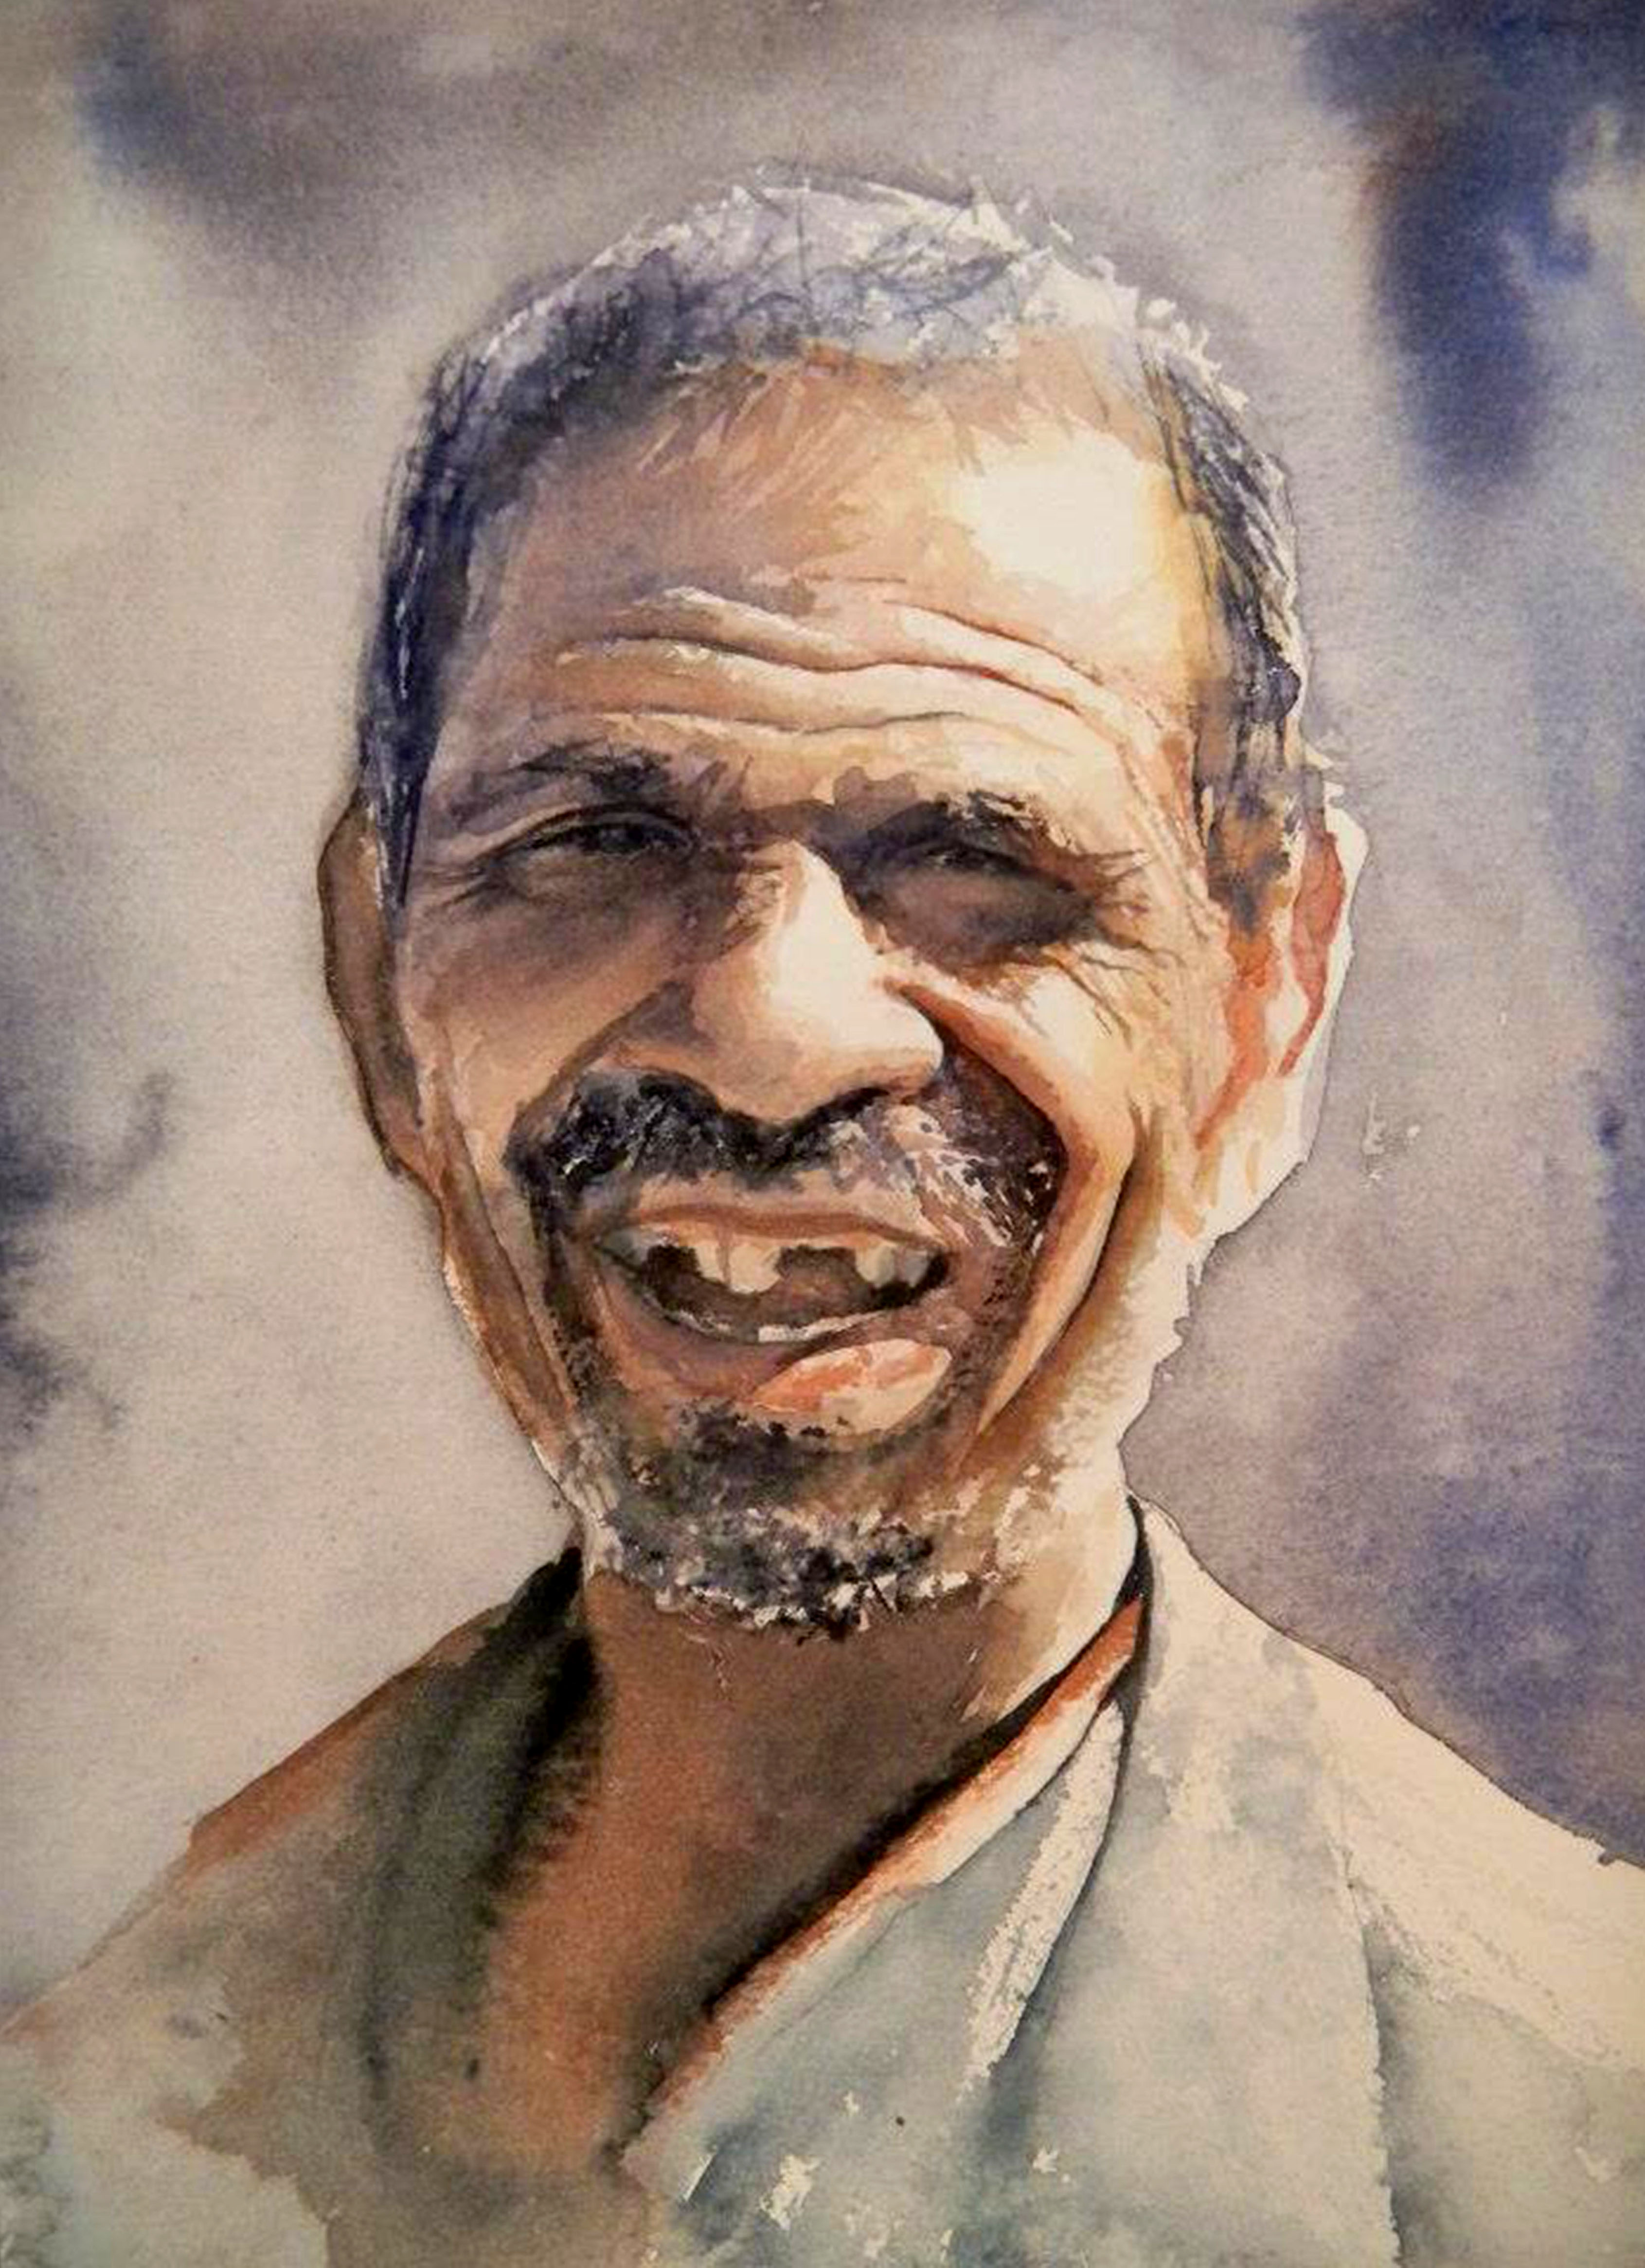 #WorldWatercolorGroup - watercolor by Dalibor Popovic Miksa of male portrait - #doodlewash